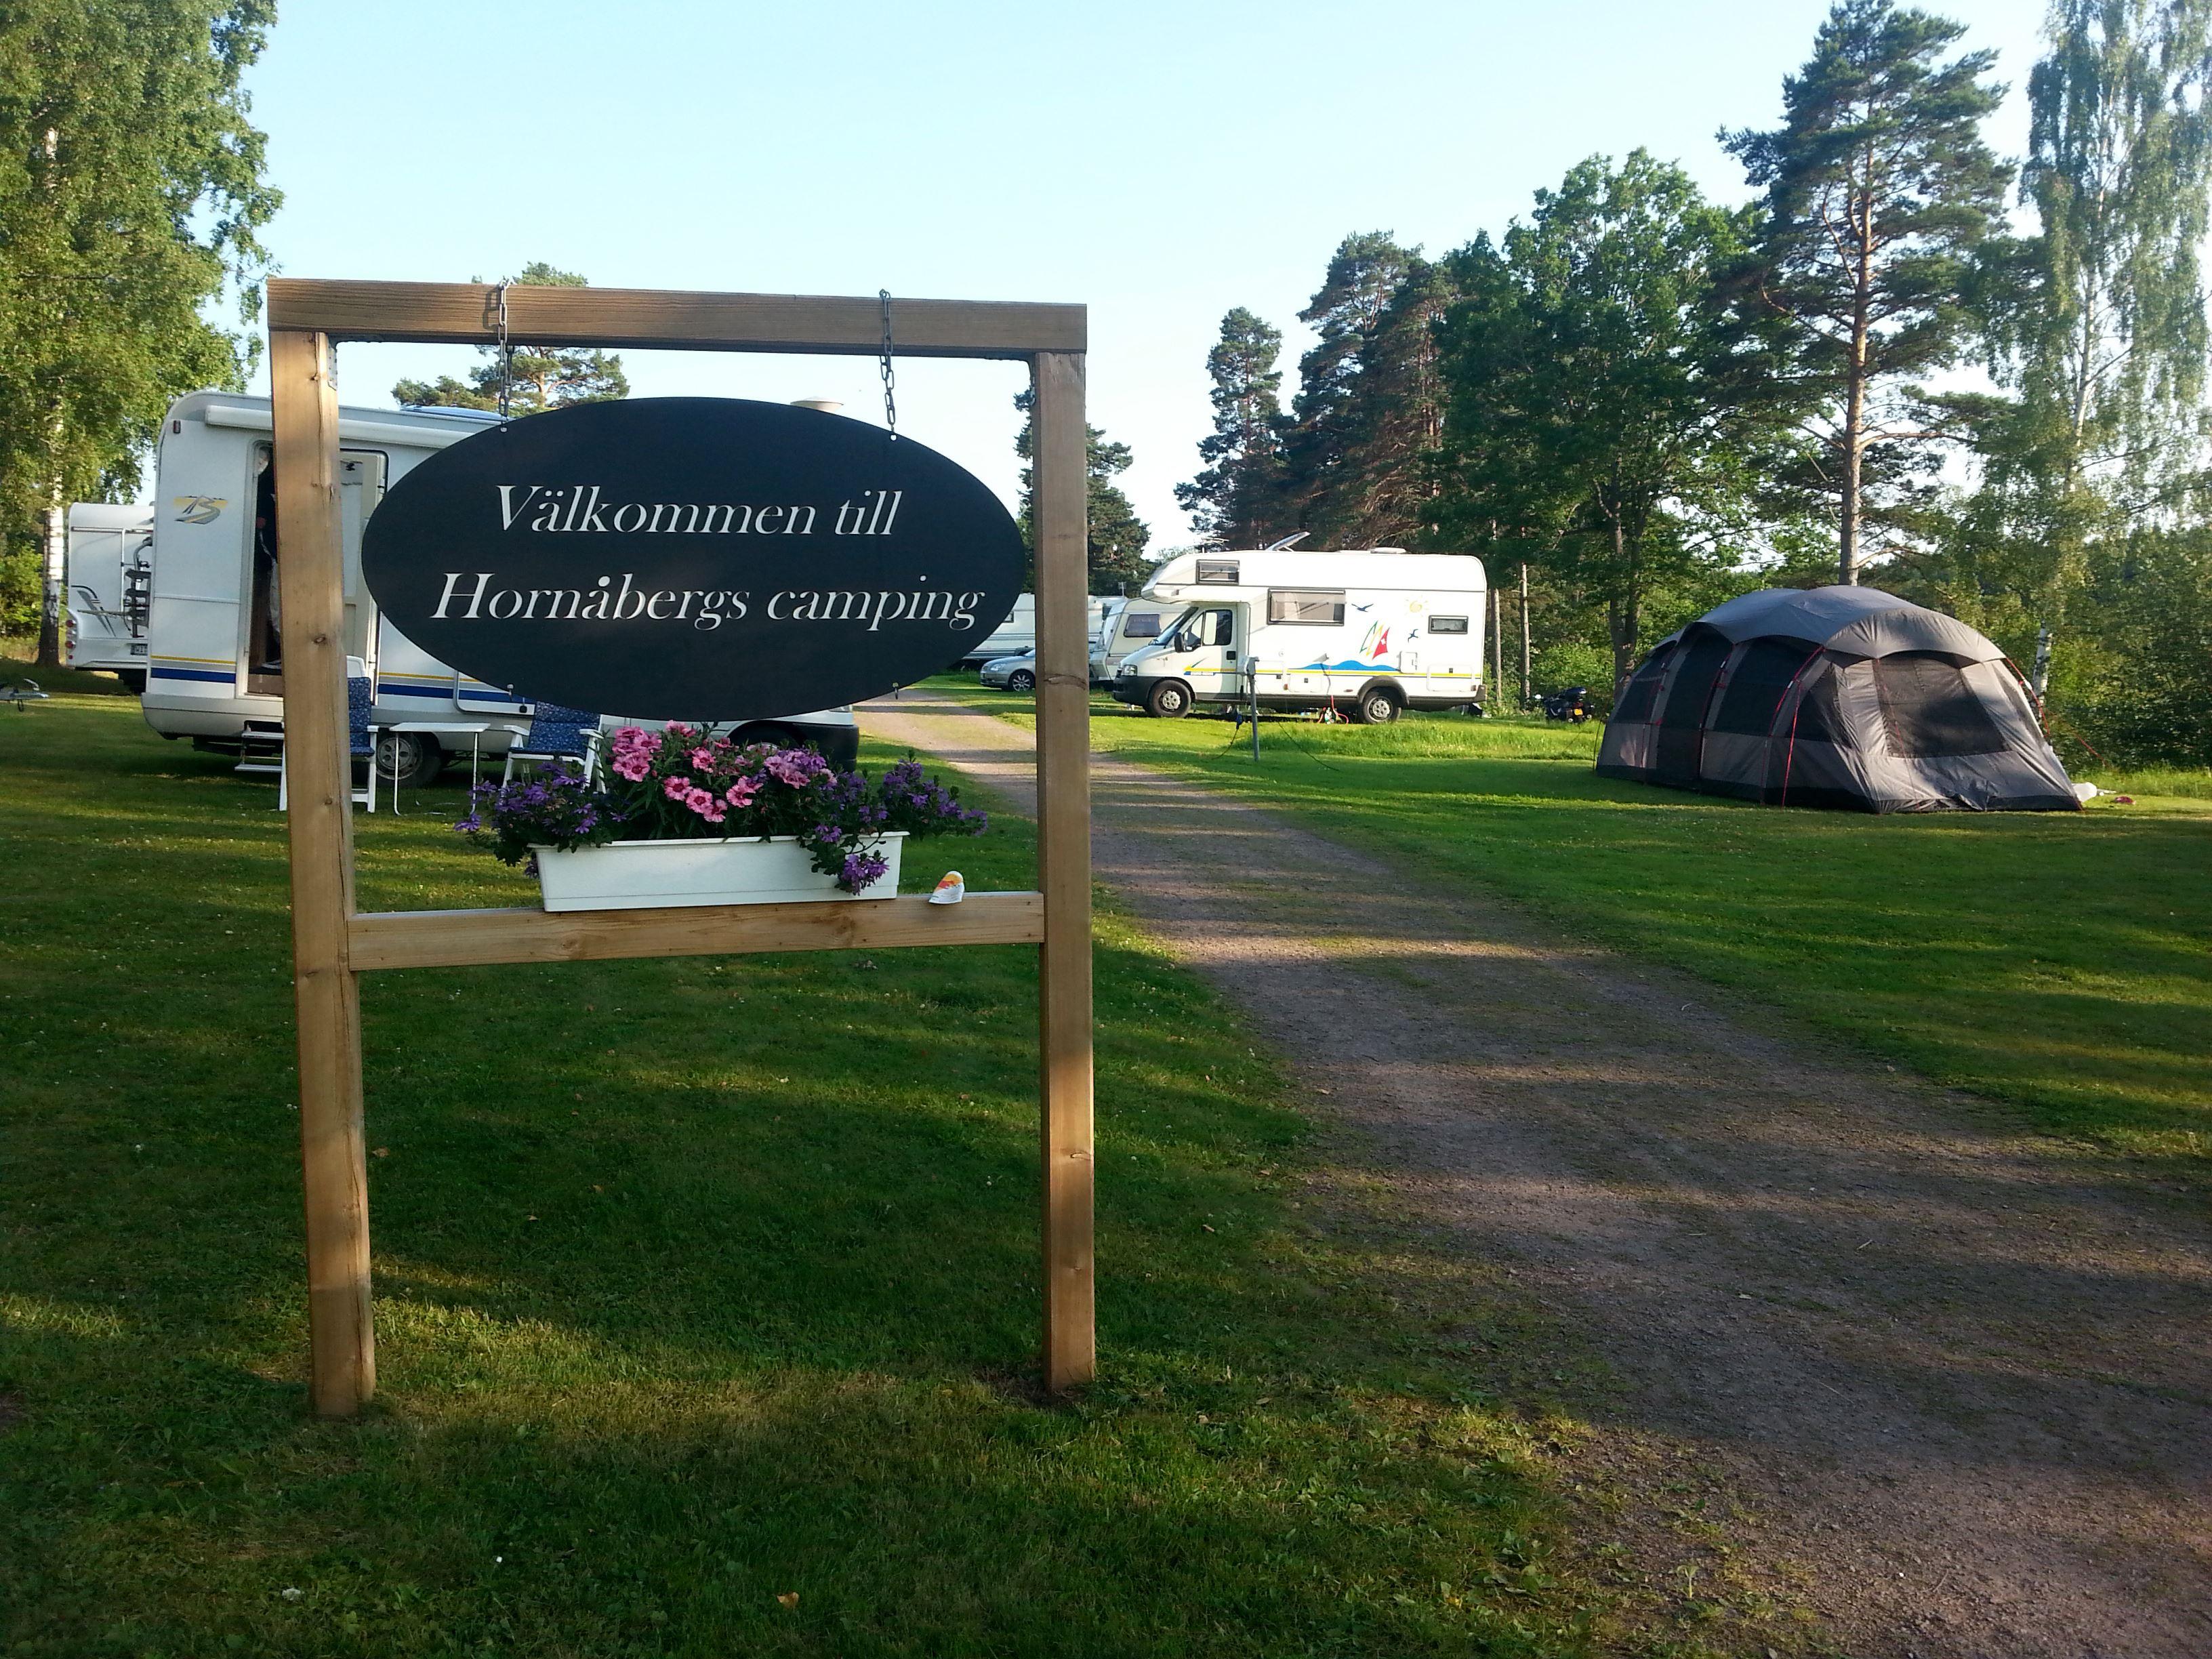 Hornåbergs Camping